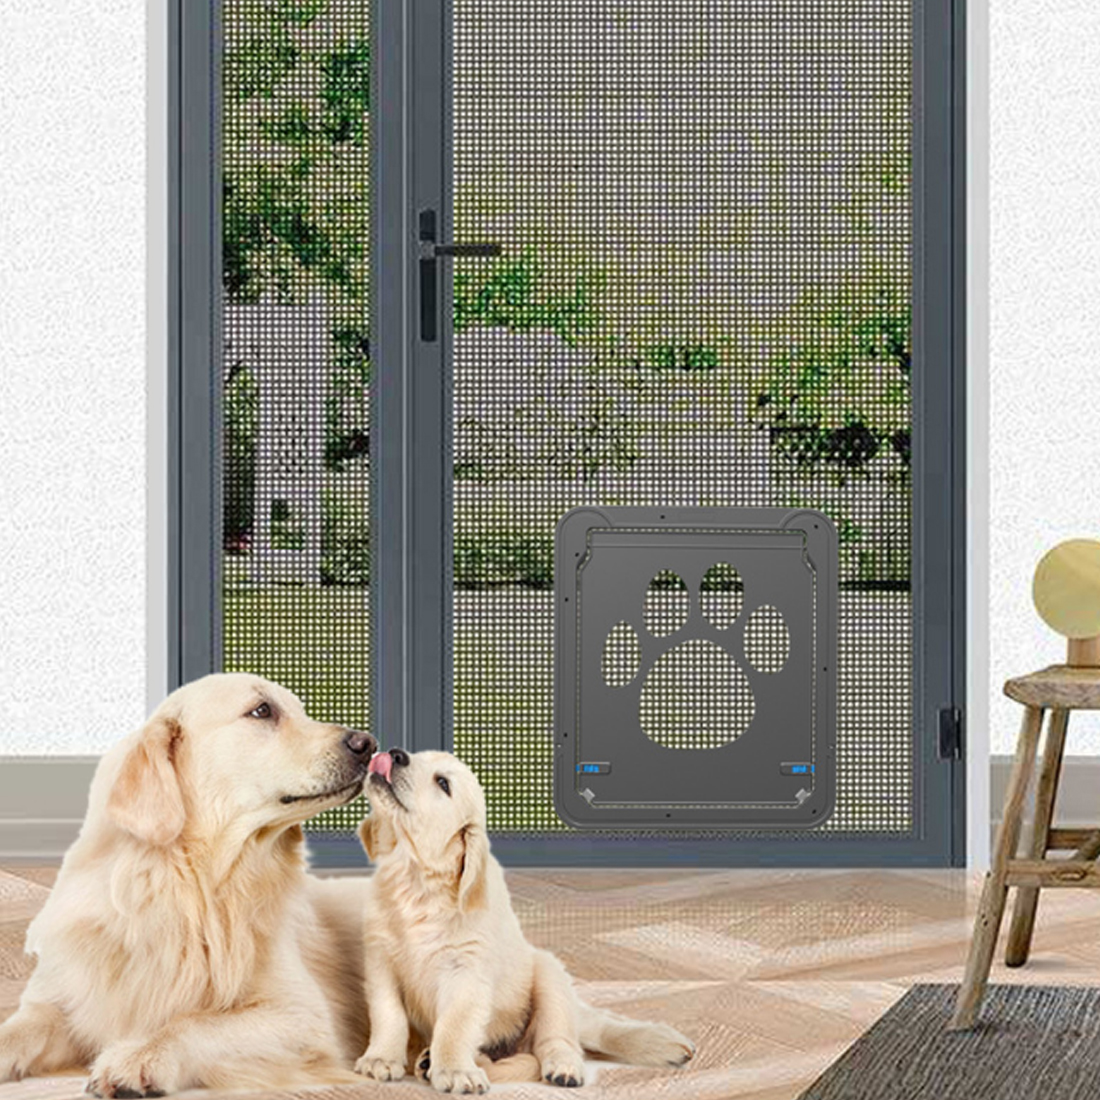 PETFORU 37cm*42cm Anti Scrape Pet Door Screen Window ABS Magnetic Auto Lock  Flaps For Dog Cat   Black